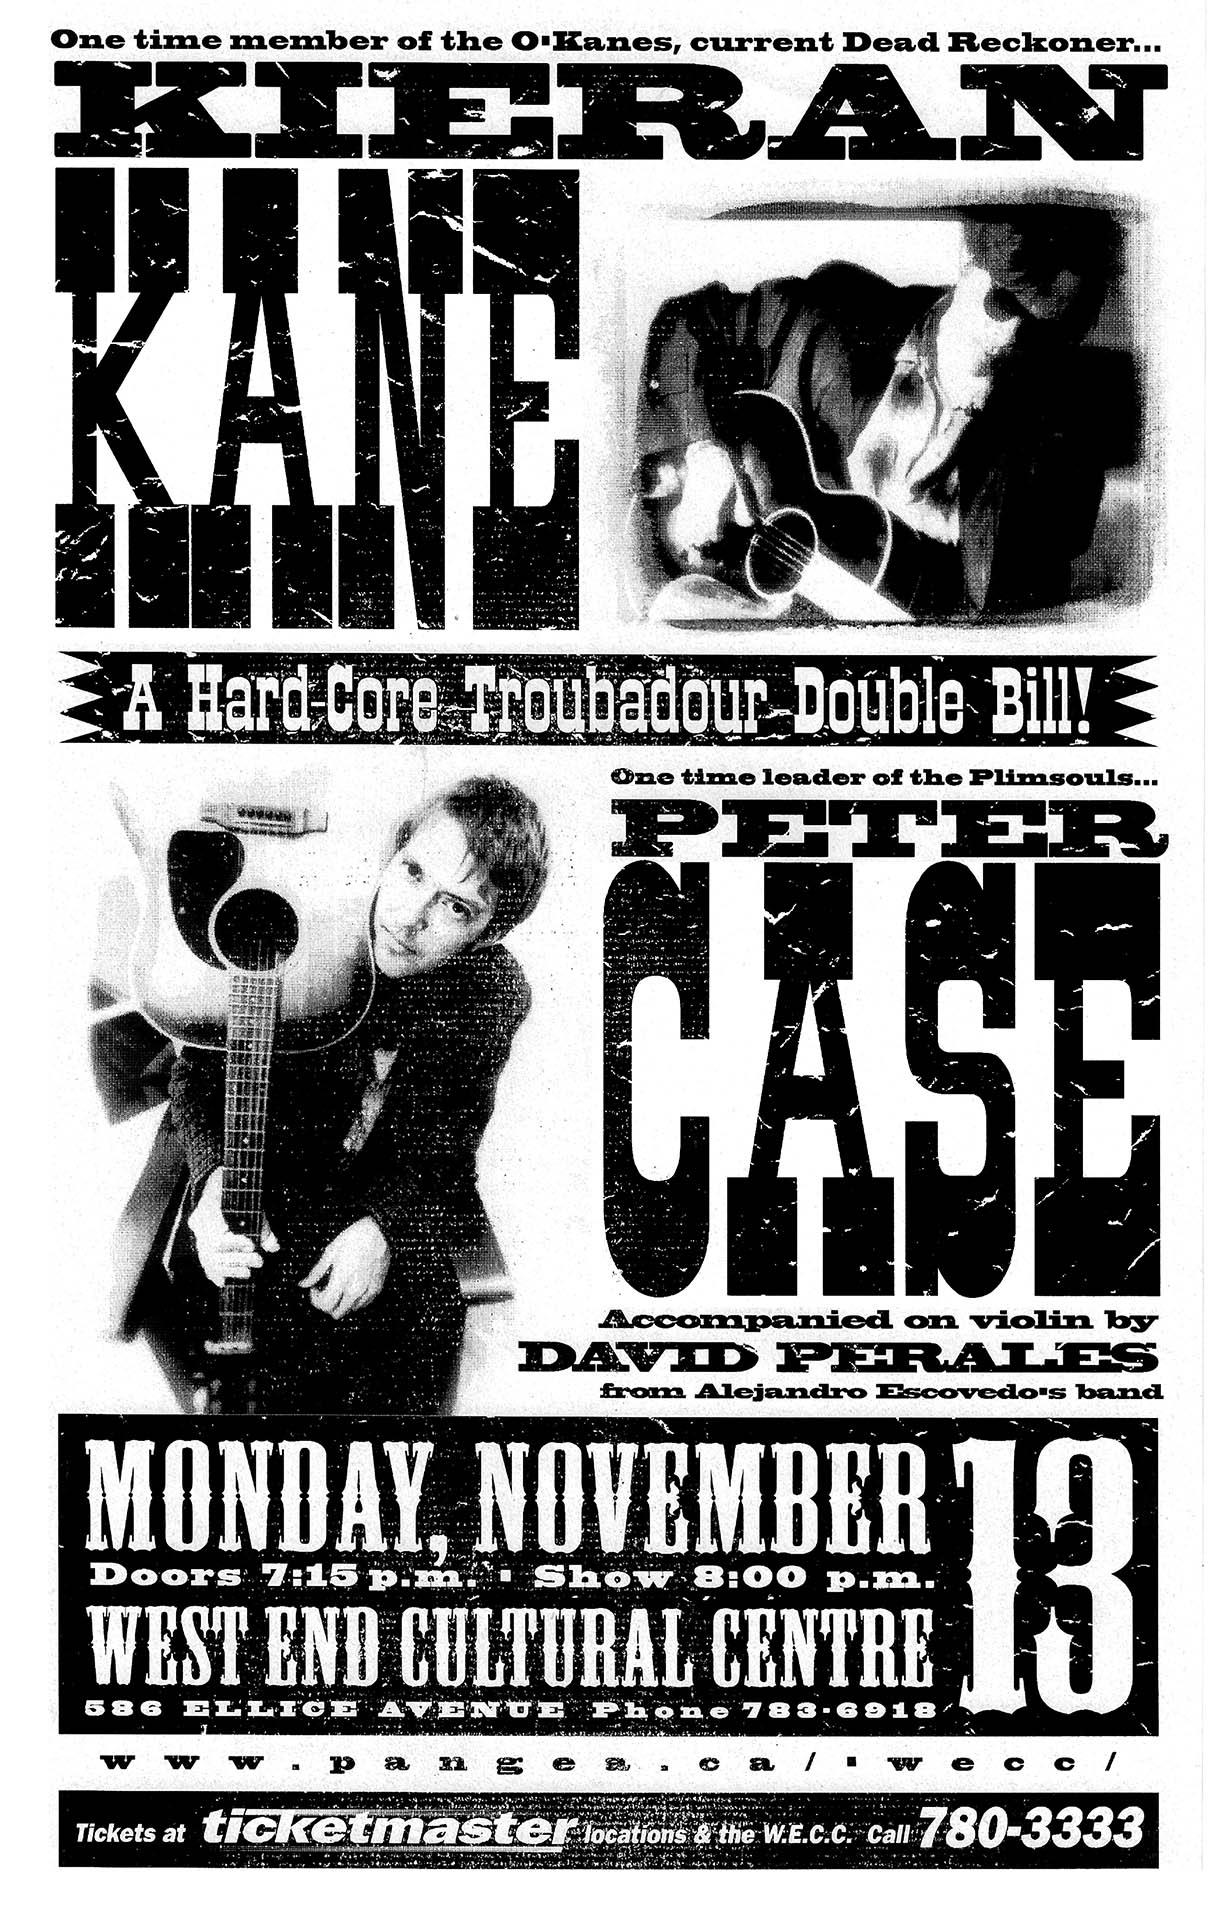 Kieran Kane - 2000